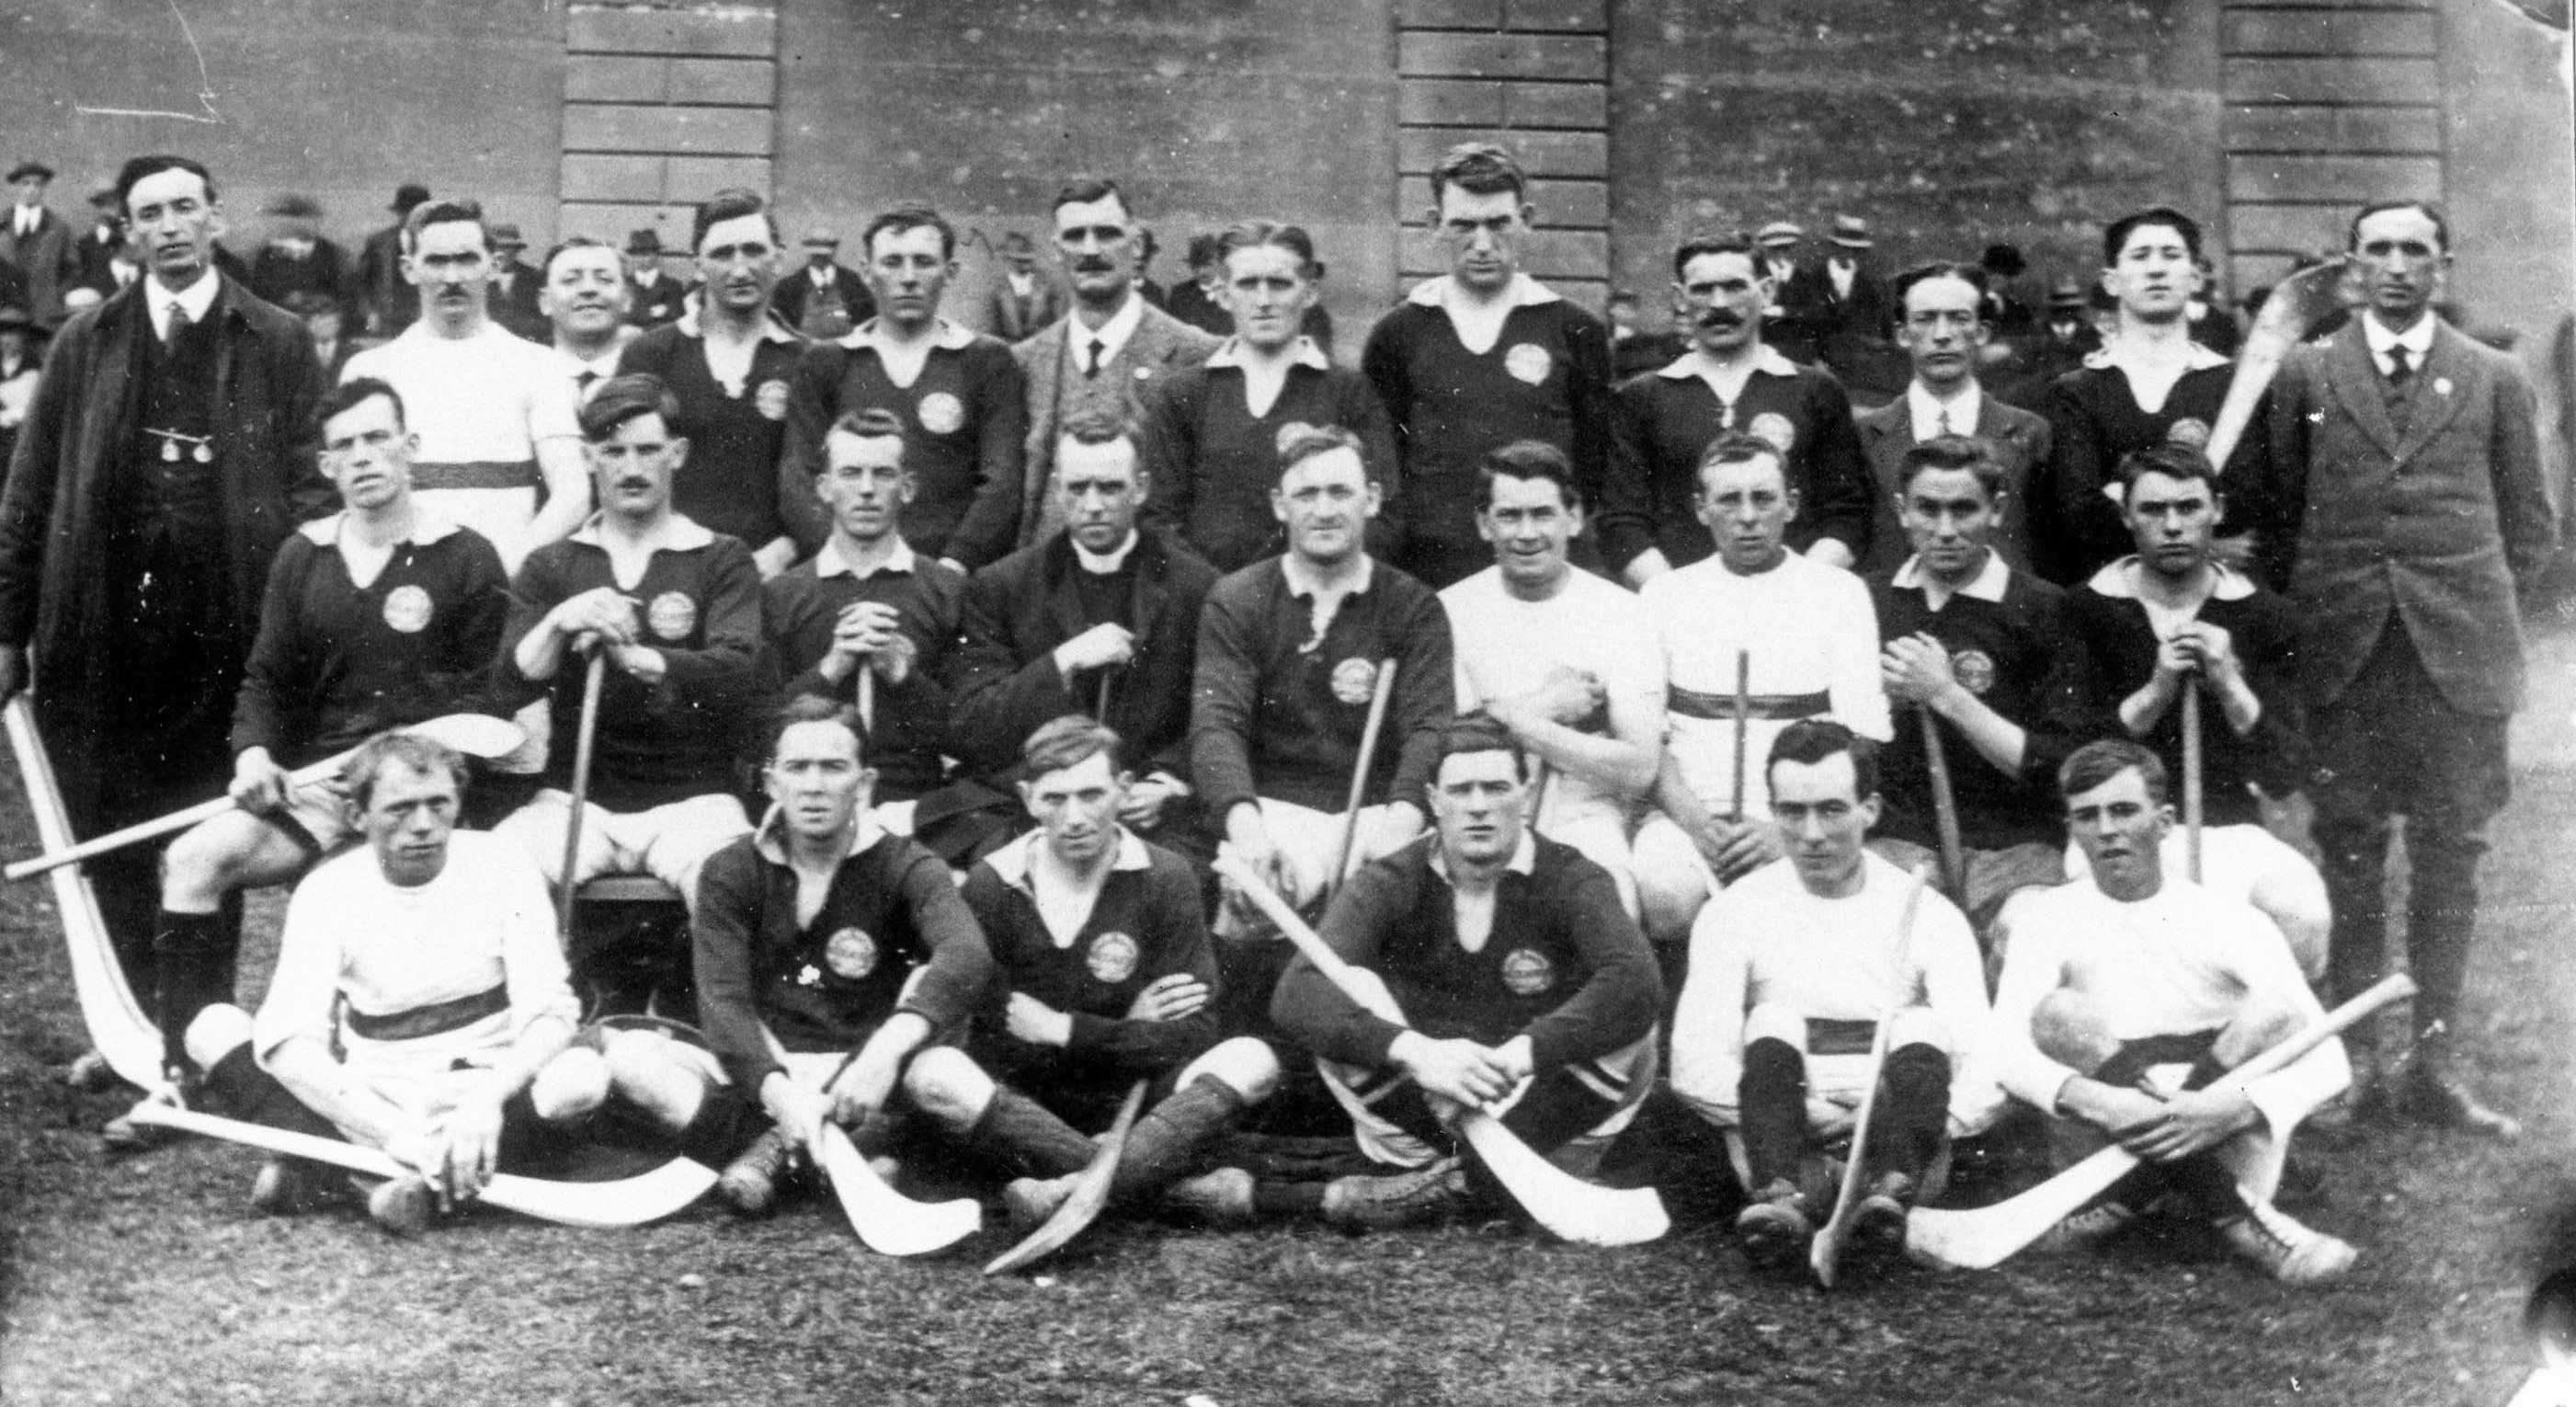 Cork (Selection) 1919 Hurling All-Ireland Champions